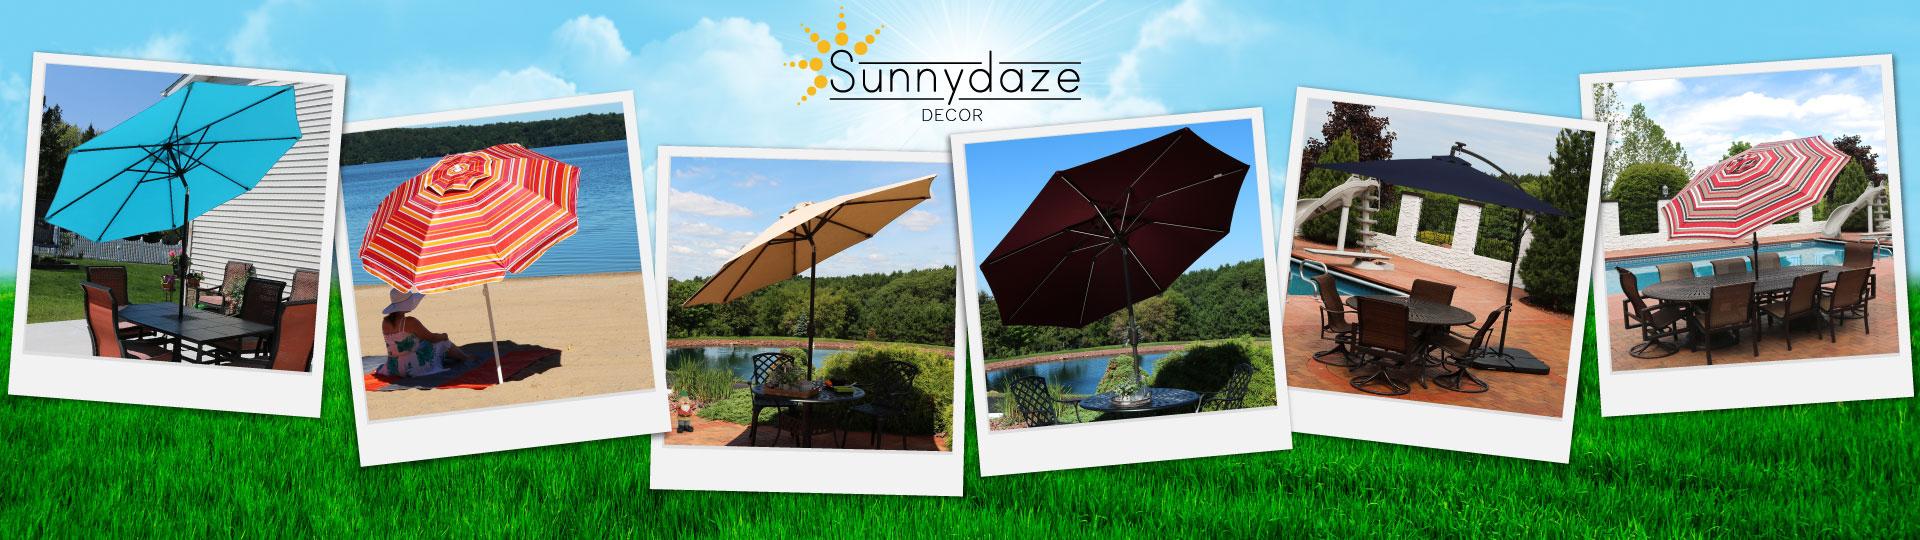 Beach And Patio Umbrellas